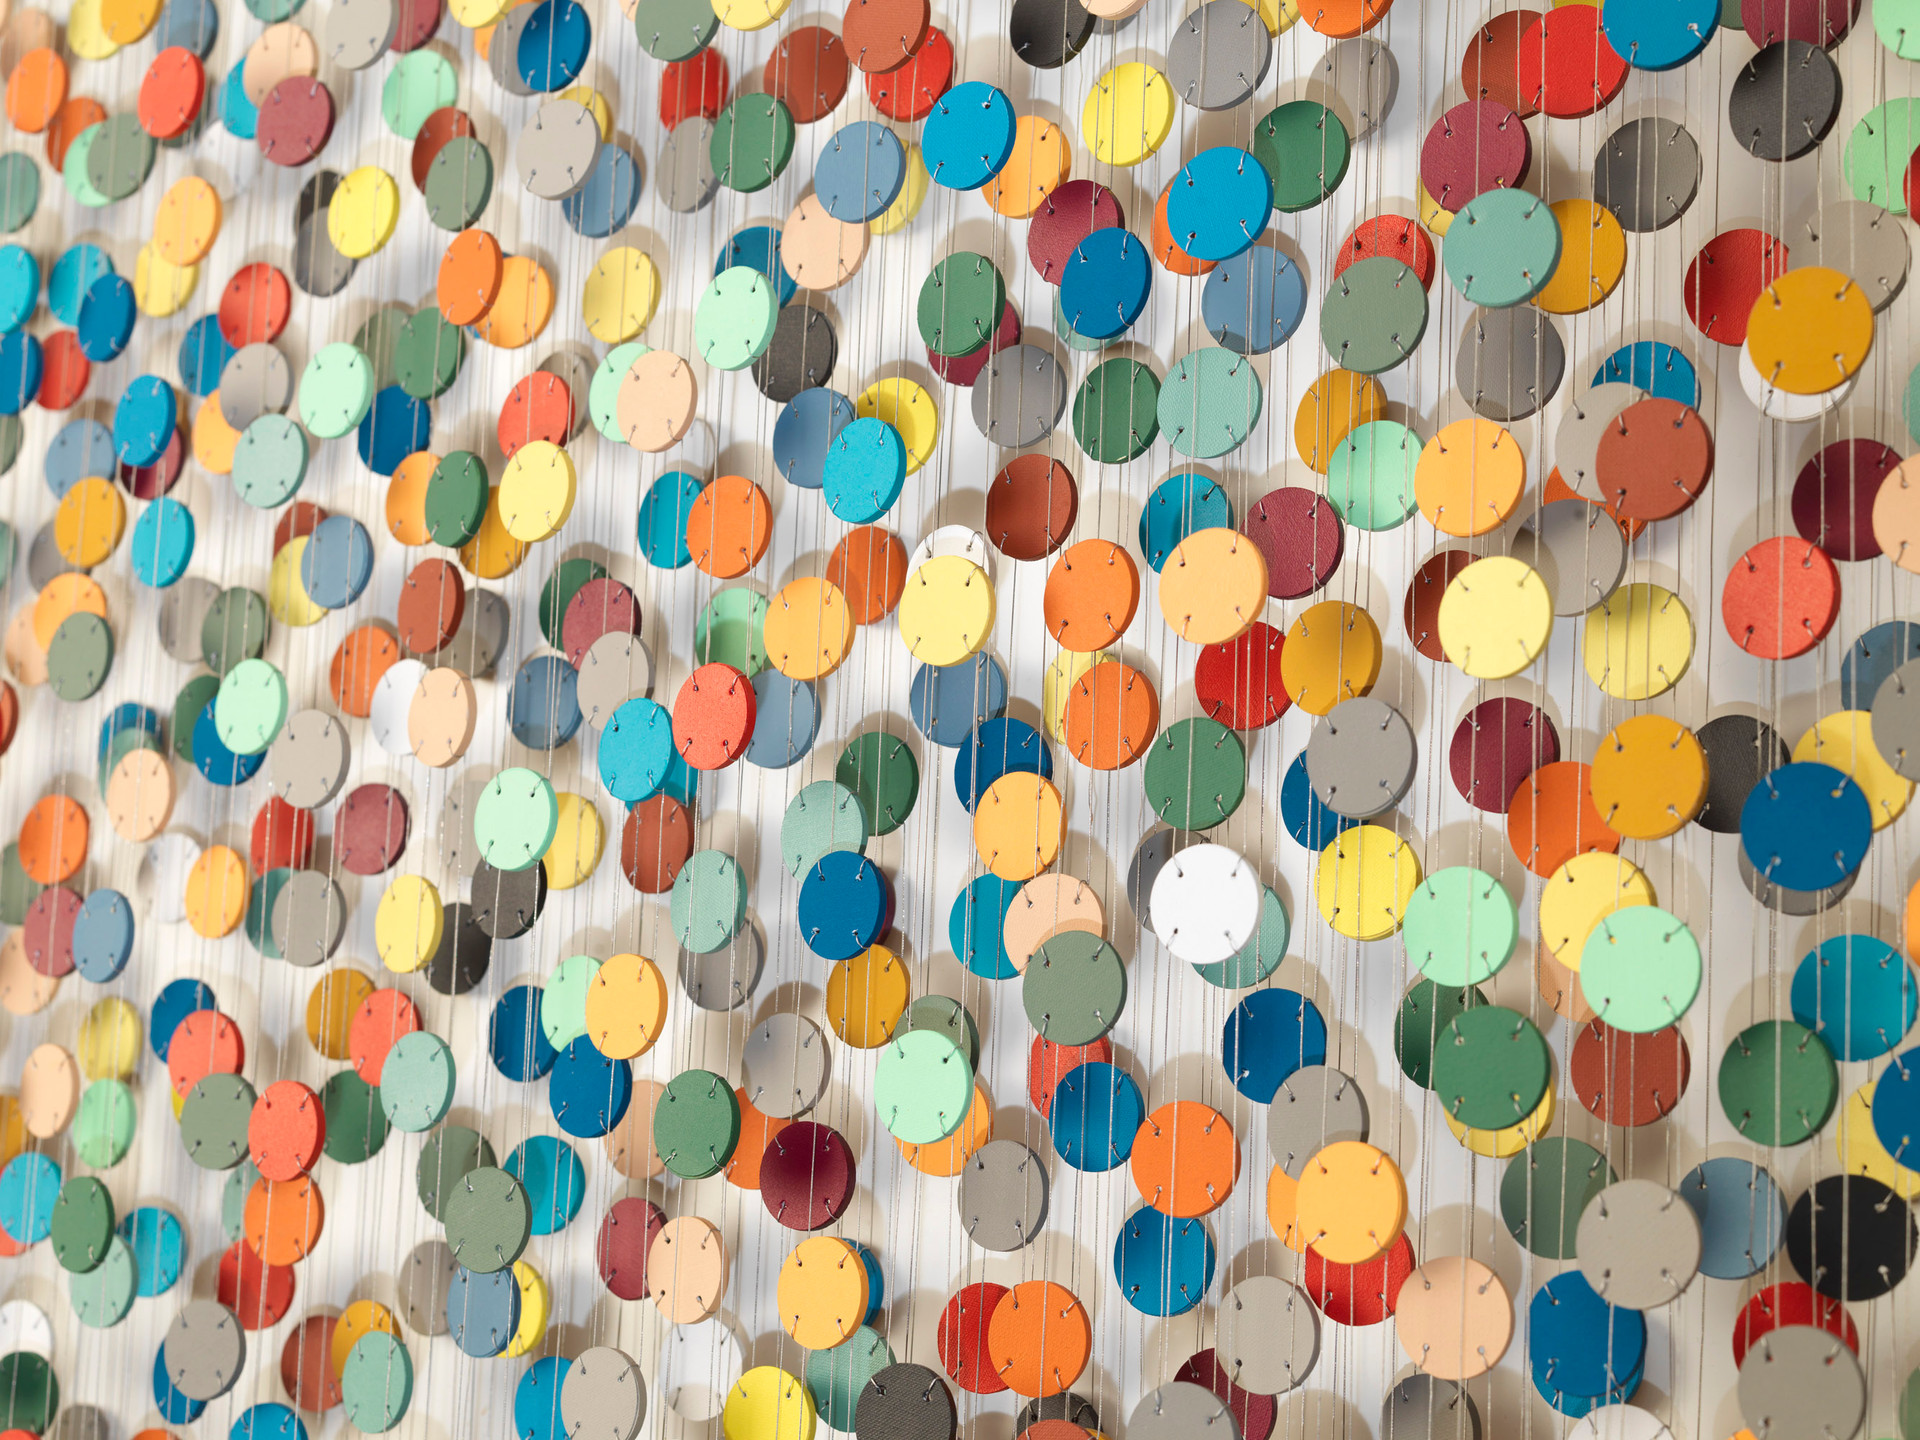 Cecilia Glazman Rainbow explosion 2017 Papel pintado a mano e hilo (Hand painted paper and thread) 100 x 100 cm.